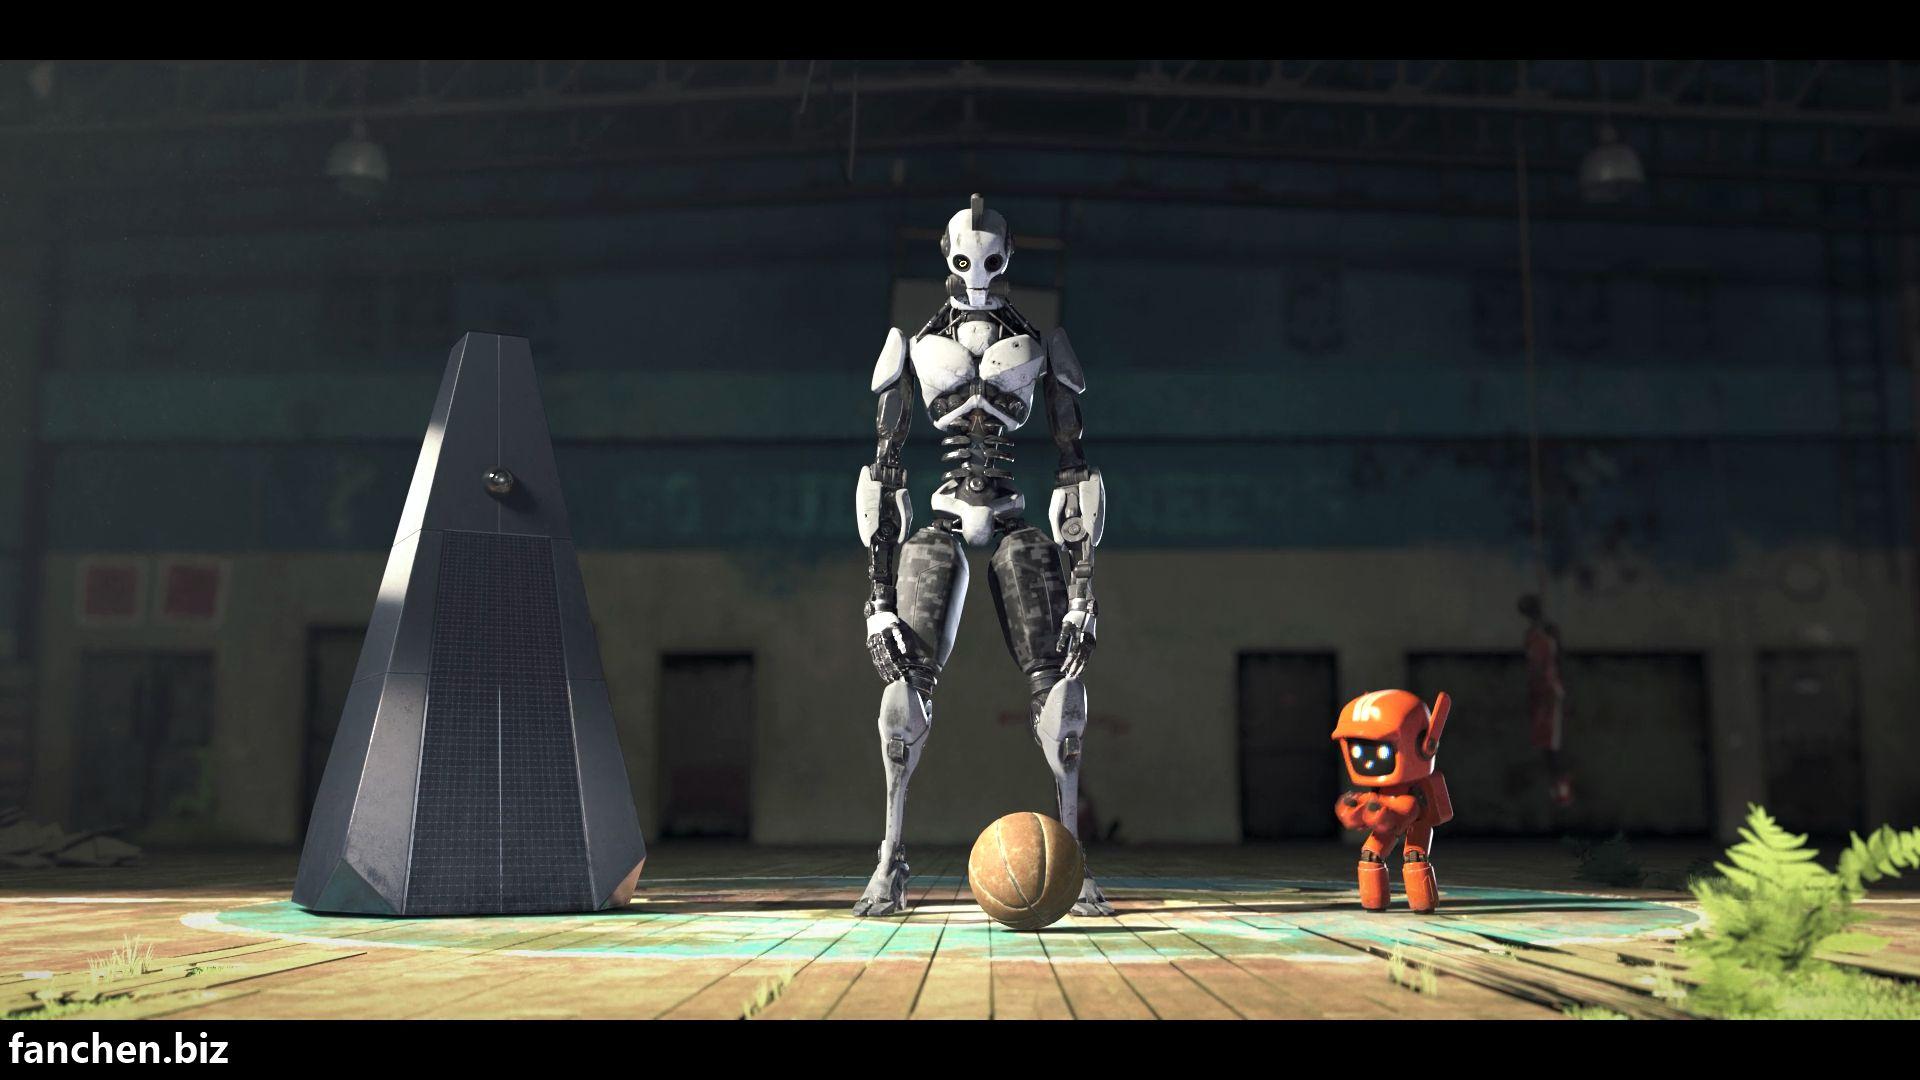 CG电影 爱,死亡和机器人1080P合集 附字幕 9.14G-FANCHENBIZ